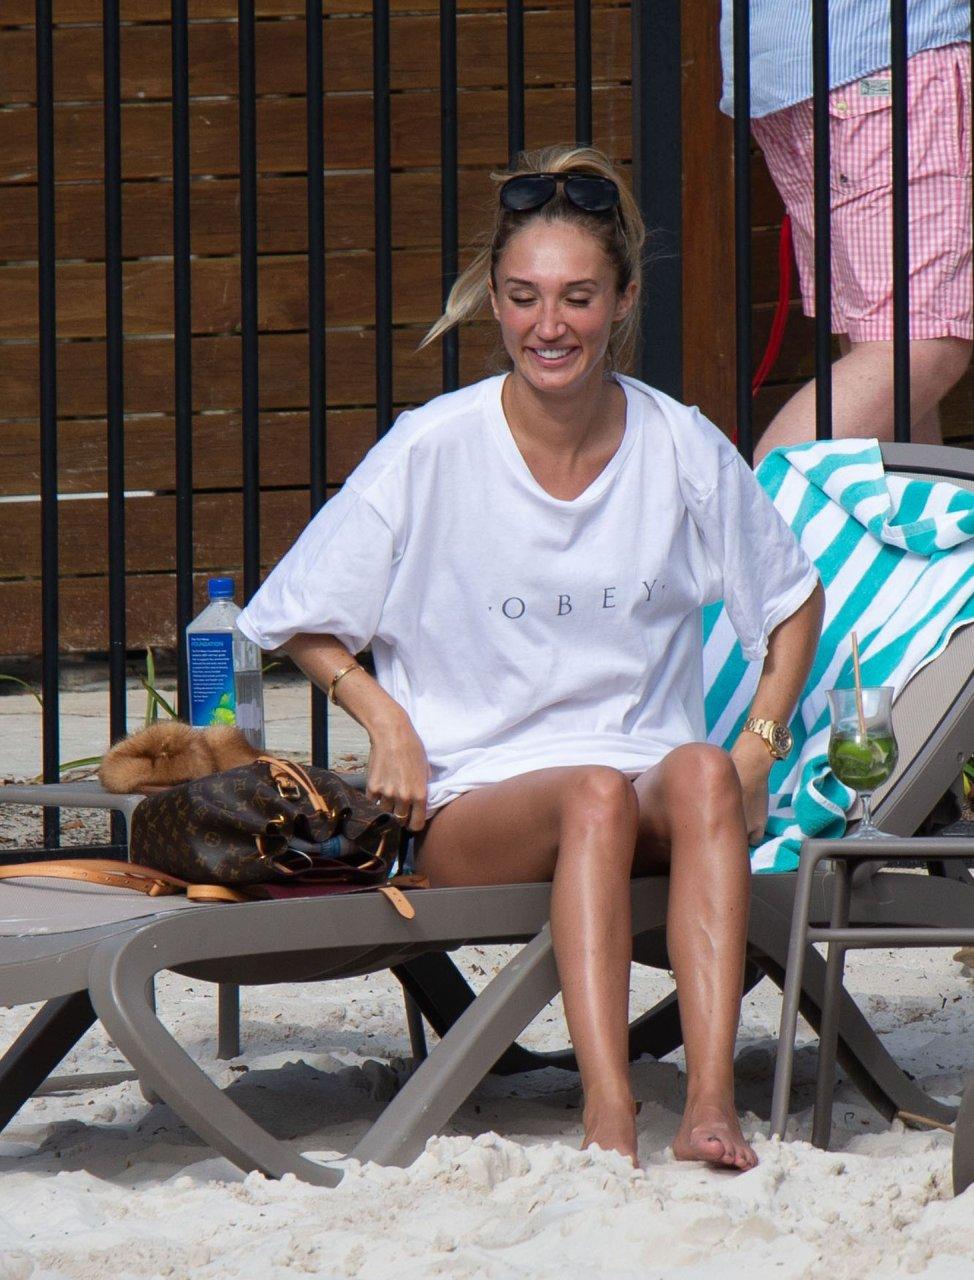 Megan McKenna Soaks Up The Sun While Enjoying A Poolside